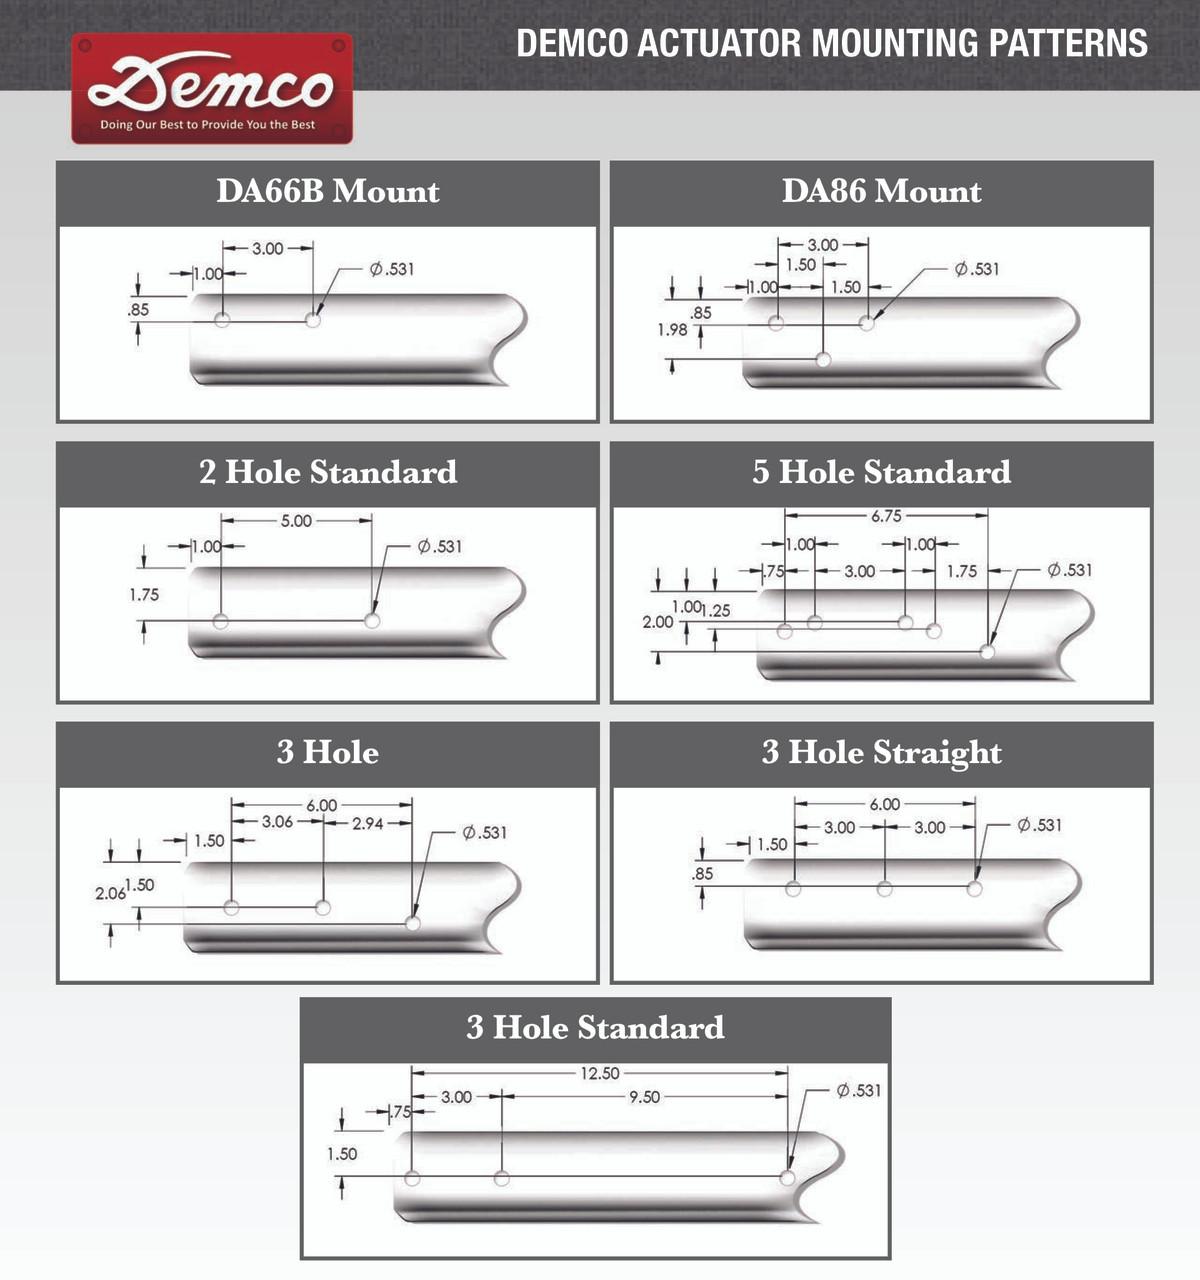 8759131 --- Demco Hydraulic Brake Actuator with Down Channel - 8,000 lb Capacity - Model DA91